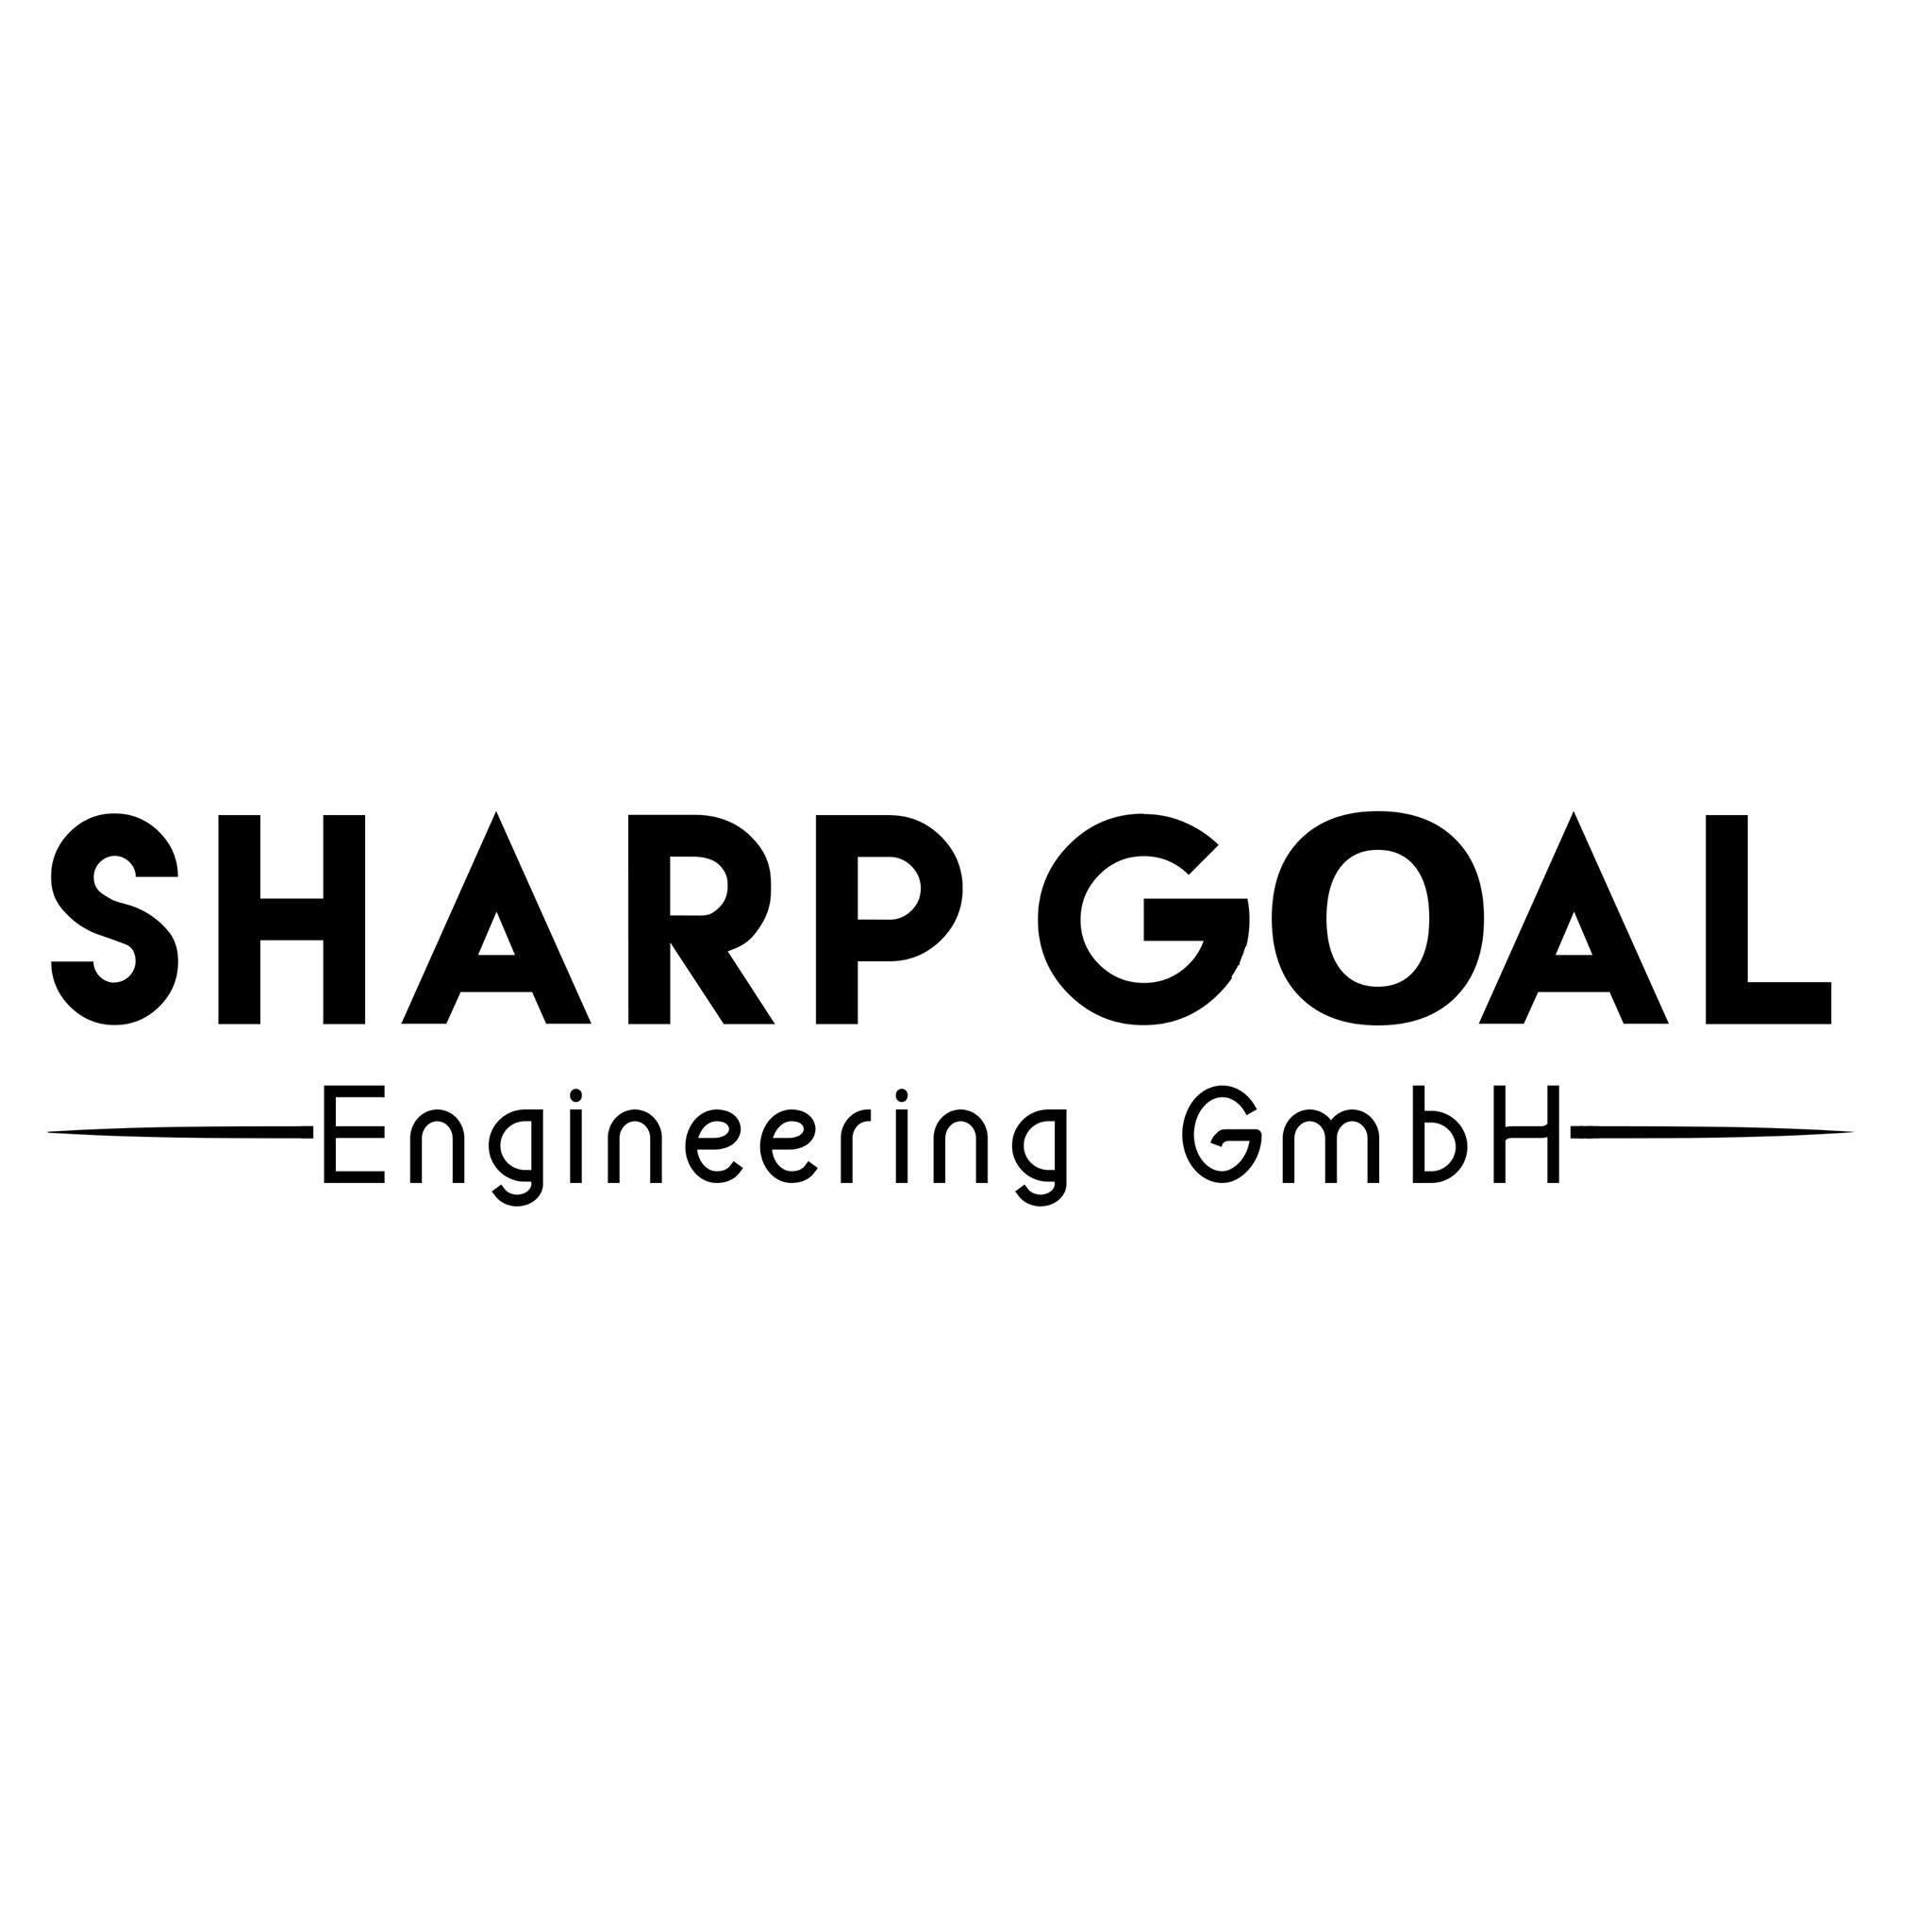 Sharp Goal Engineering GmbH